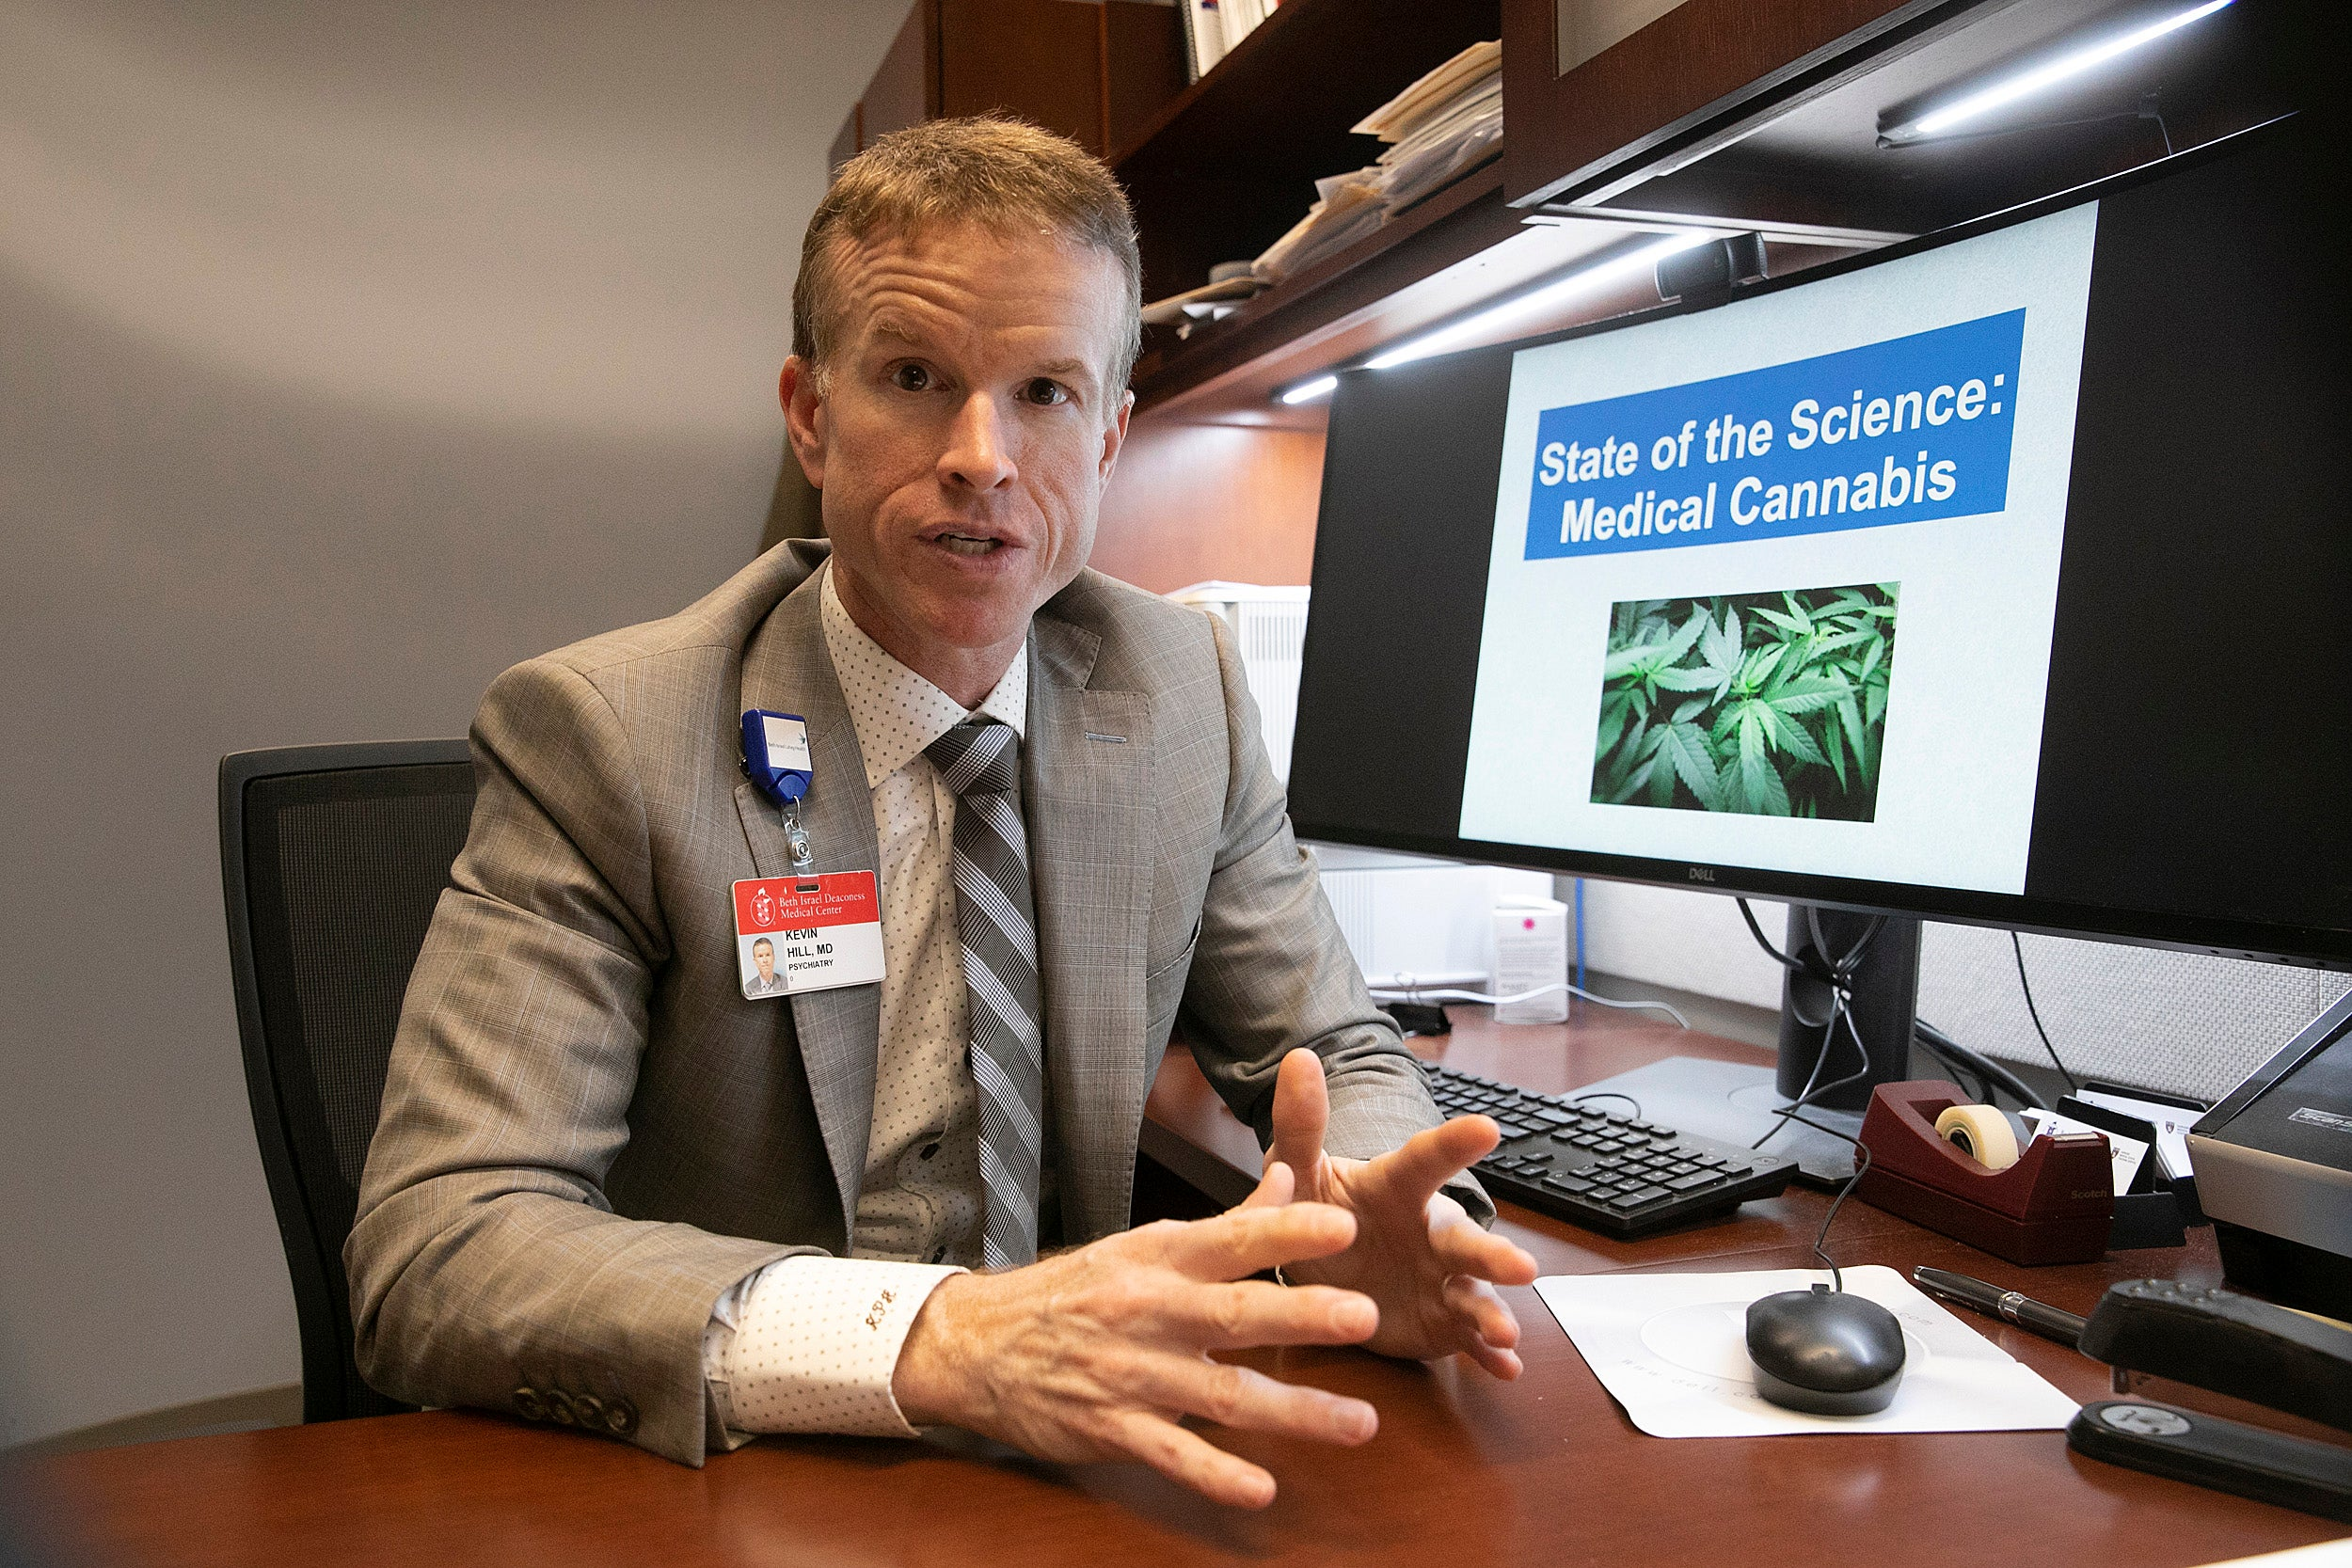 Professor sitting at desk with computer monitor showing marijuana.